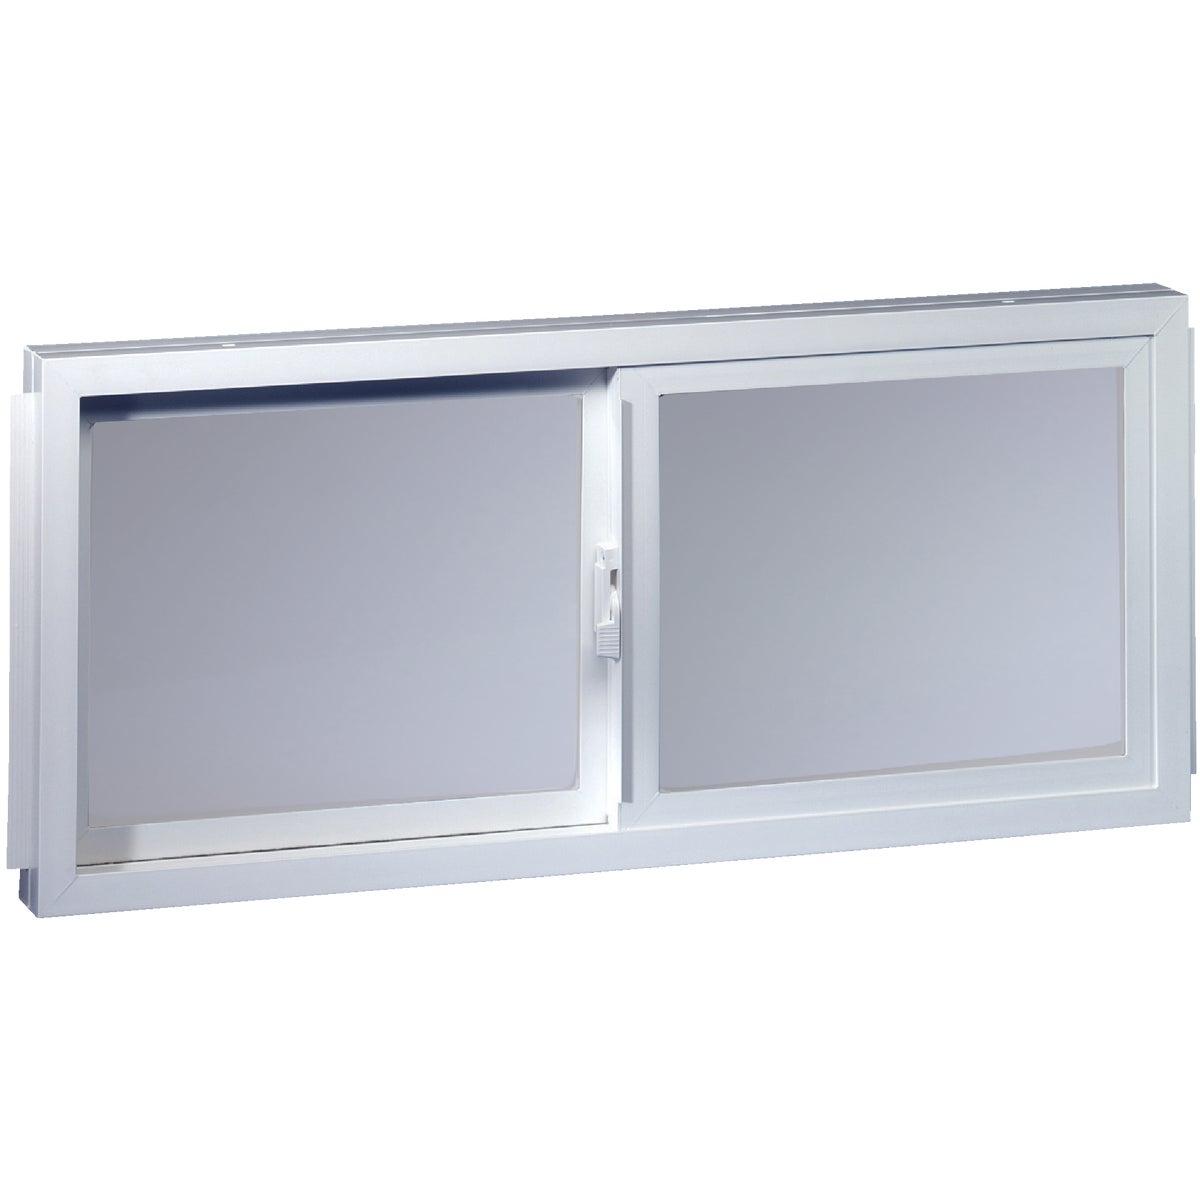 WHT BSMT SLDR WINDOW